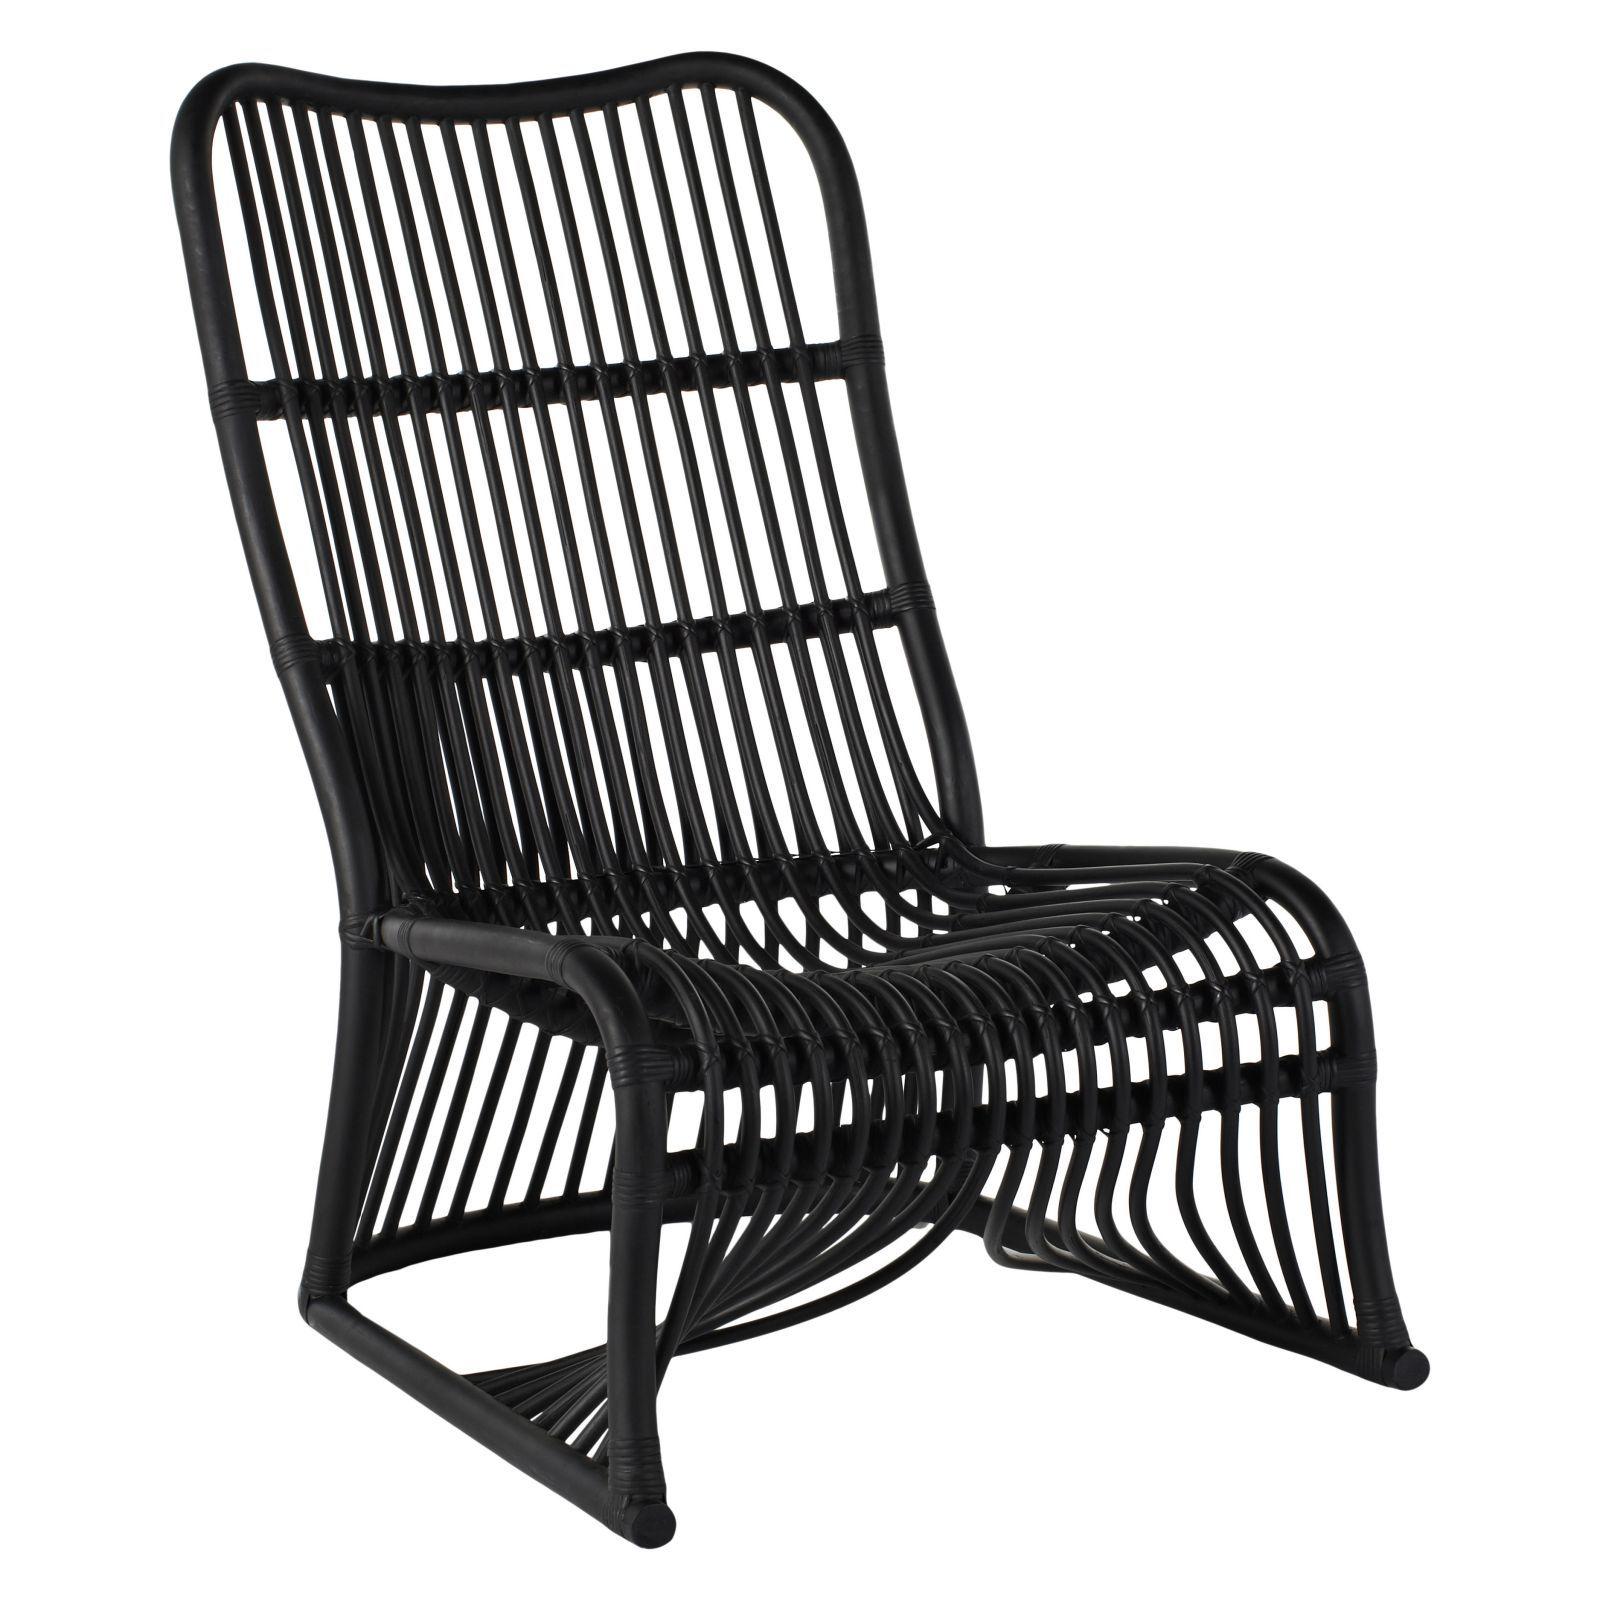 GLOBE WEST Tango Ocho Occasional Chair